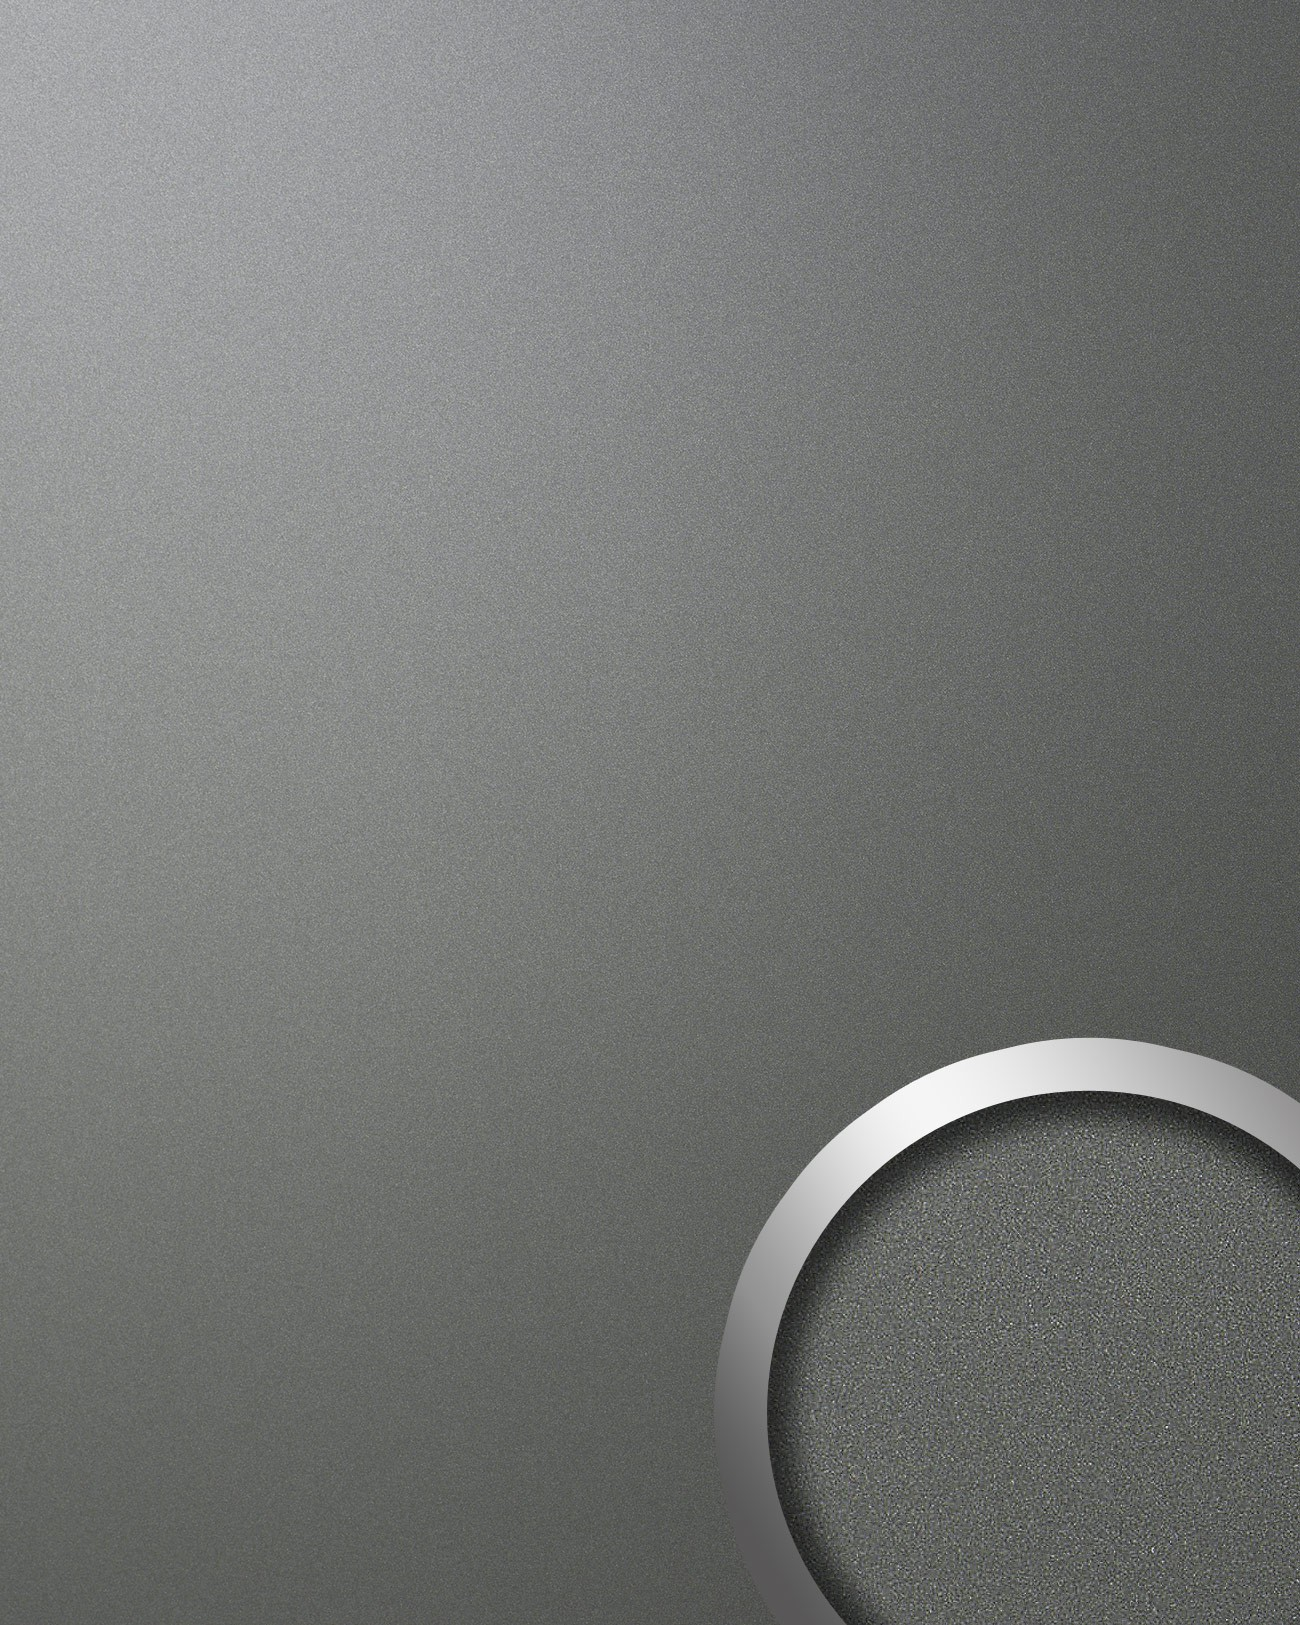 panneau mural autoadh sif wallface 10389 deco smoke apparence plastique rev tement mural gris 2. Black Bedroom Furniture Sets. Home Design Ideas